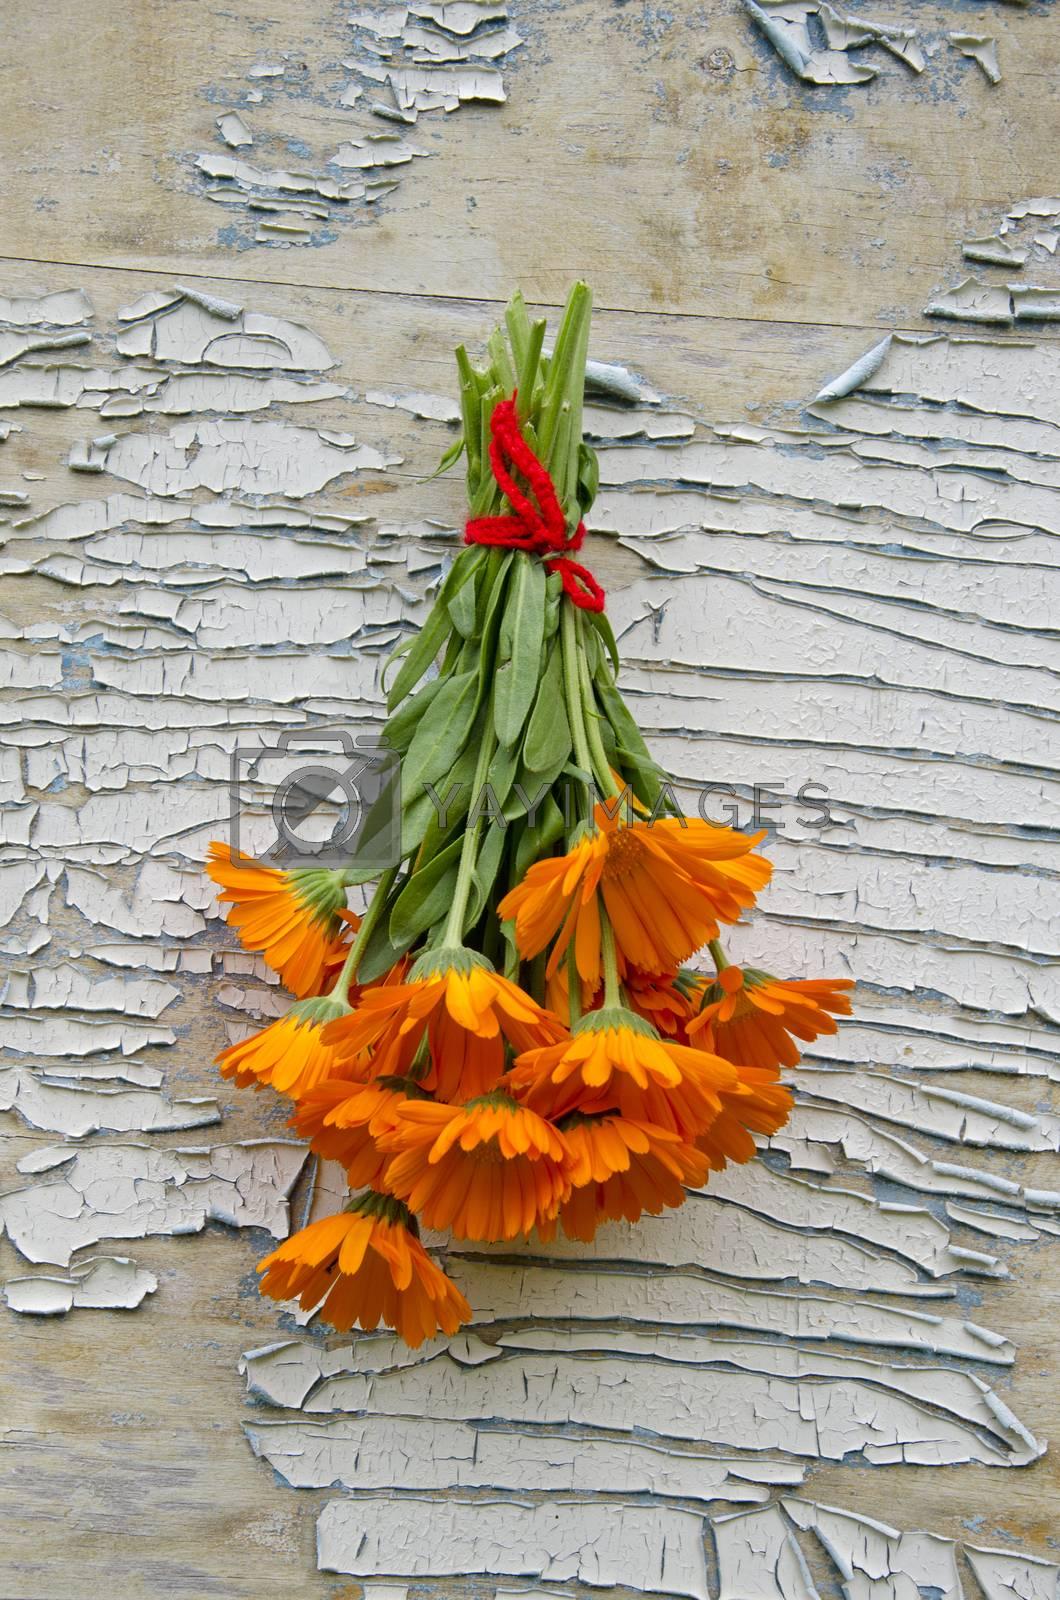 Royalty free image of Bunch freshly picked calendula hanging on peeling background by alis_photo